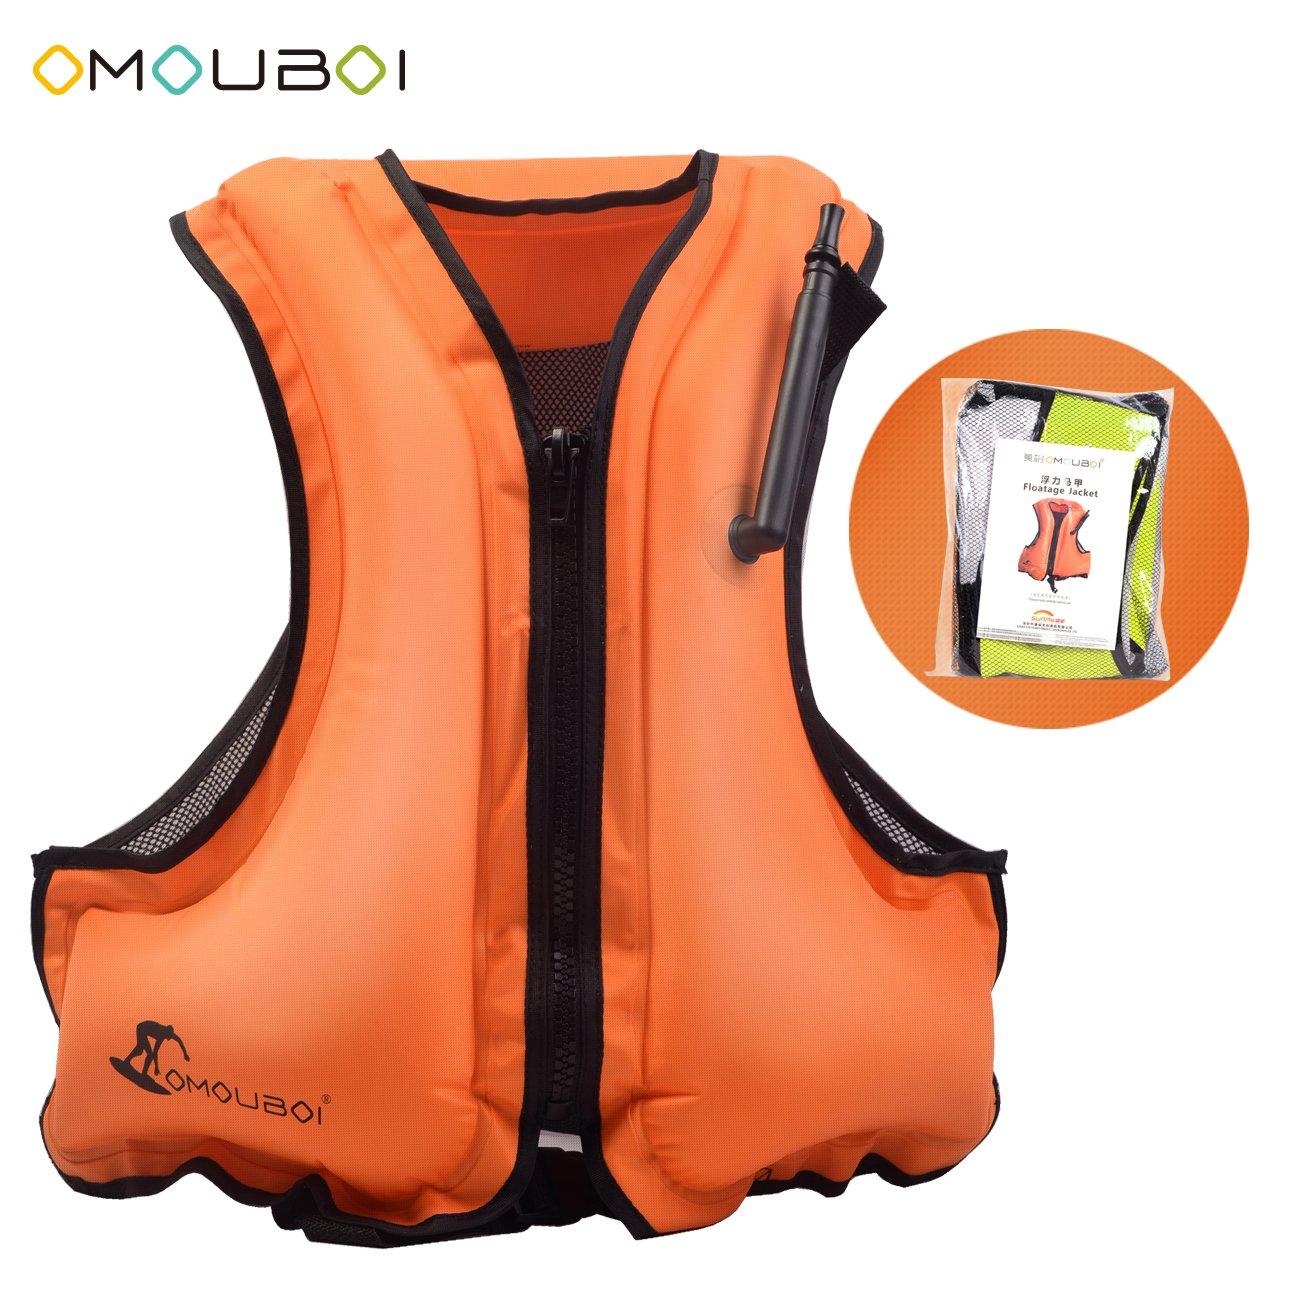 OMOUBOI シュノーケルベスト インフレータブル ライフ 水泳ベスト シュノーケリング用   B07FLP4H1F